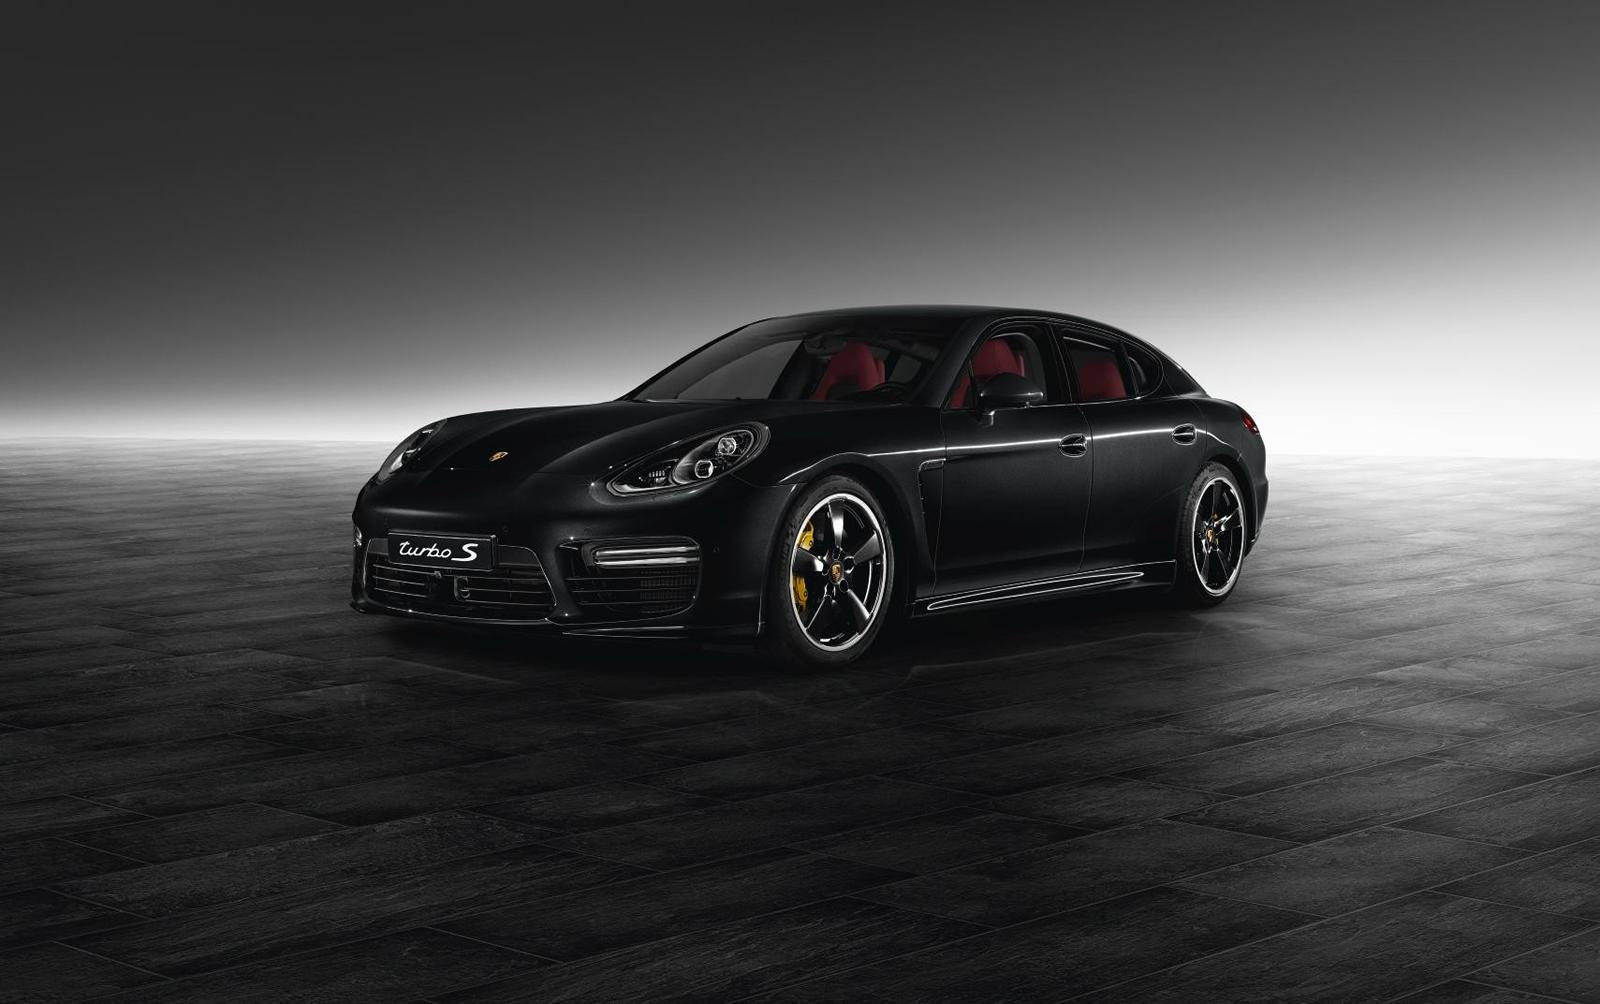 Future-Car-2016-Porsche-Panamera-Turbo-Exterior-Black-Color-.jpg